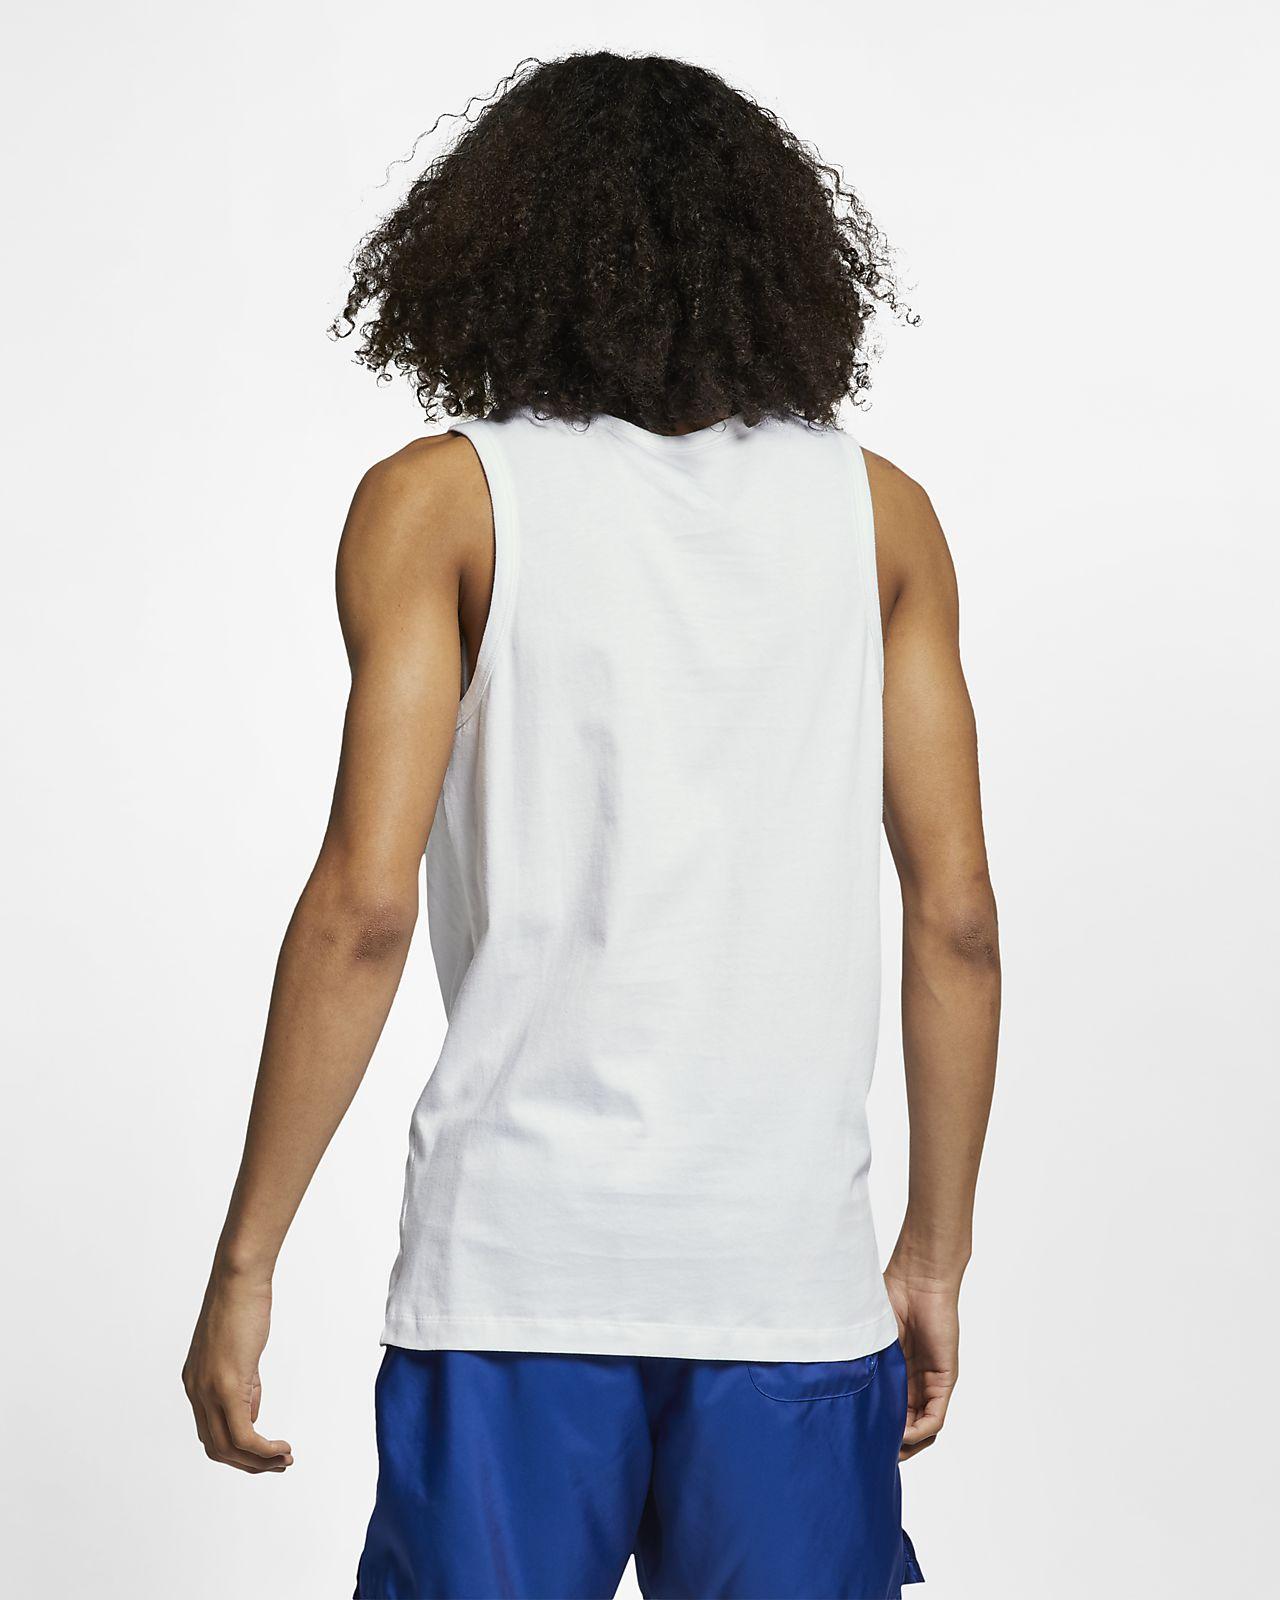 8ea11a60cb Low Resolution Nike Sportswear férfi trikó Nike Sportswear férfi trikó